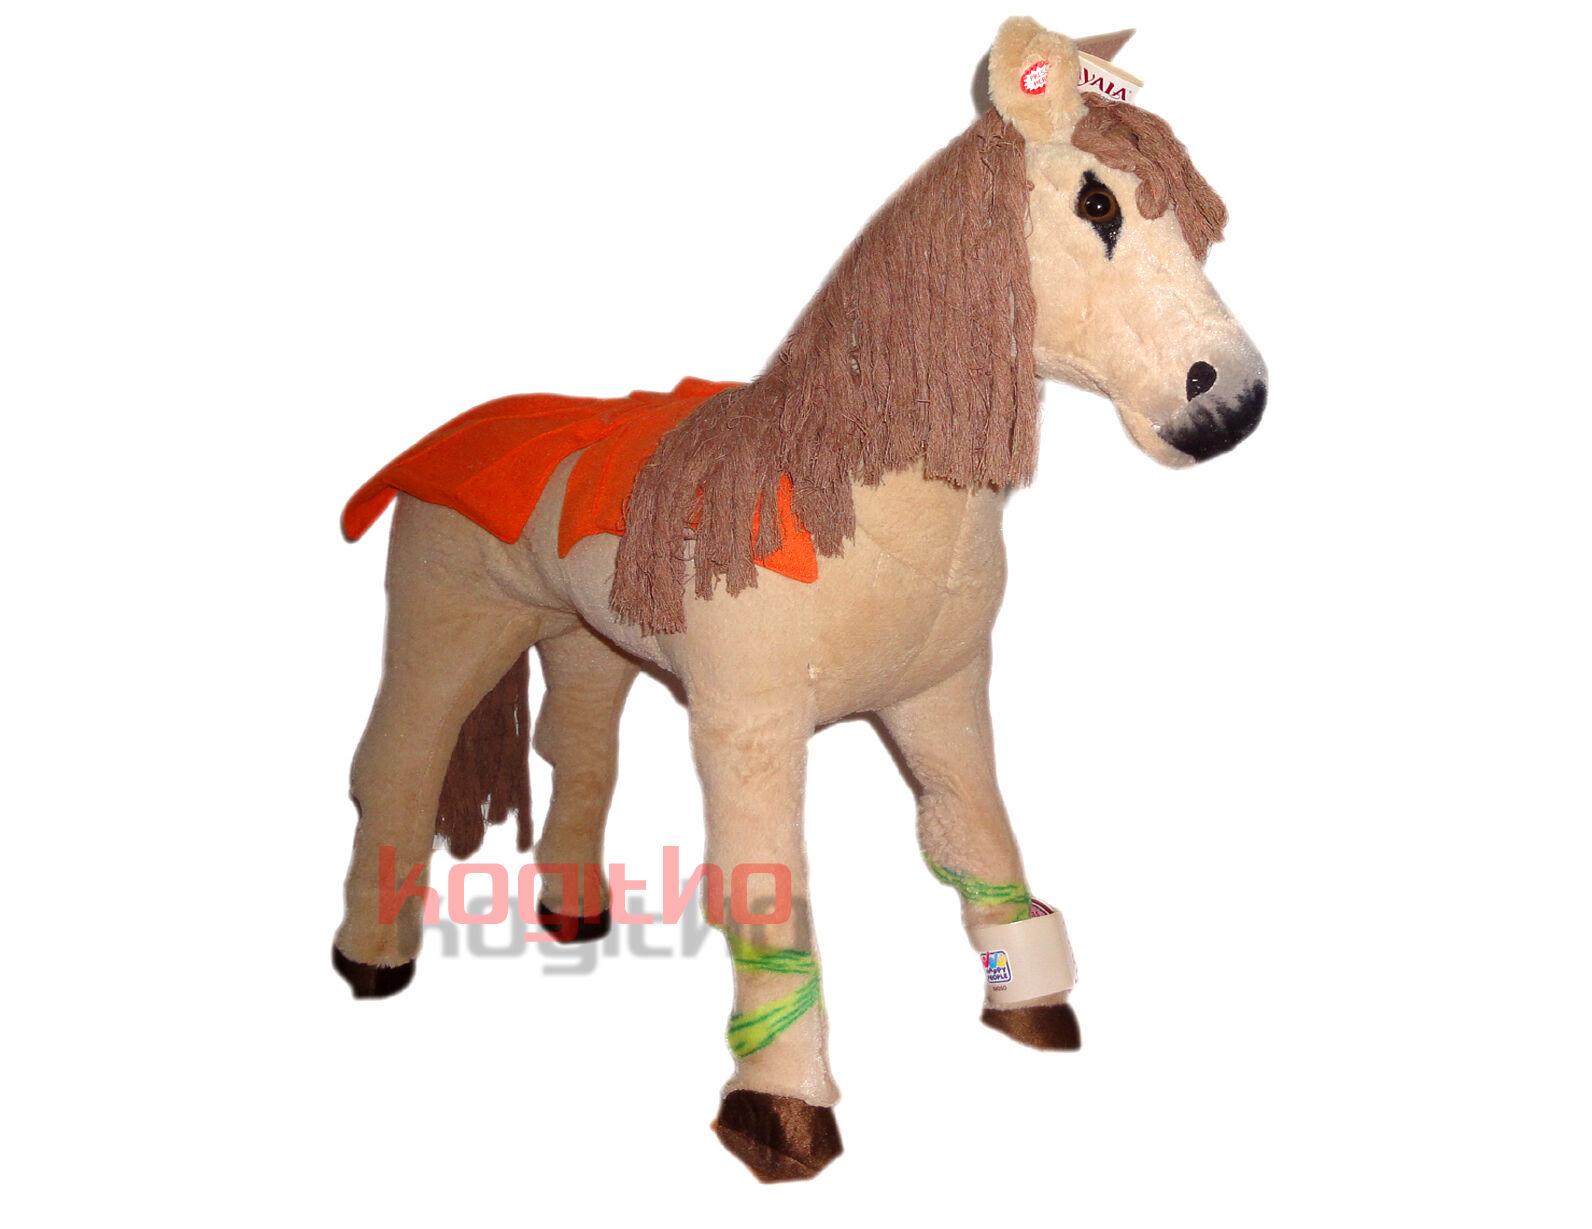 Horse ritterpferd BAYALA BAYALA BAYALA SCHLEICH Game Riding Sound Animal 80cm cd95d5